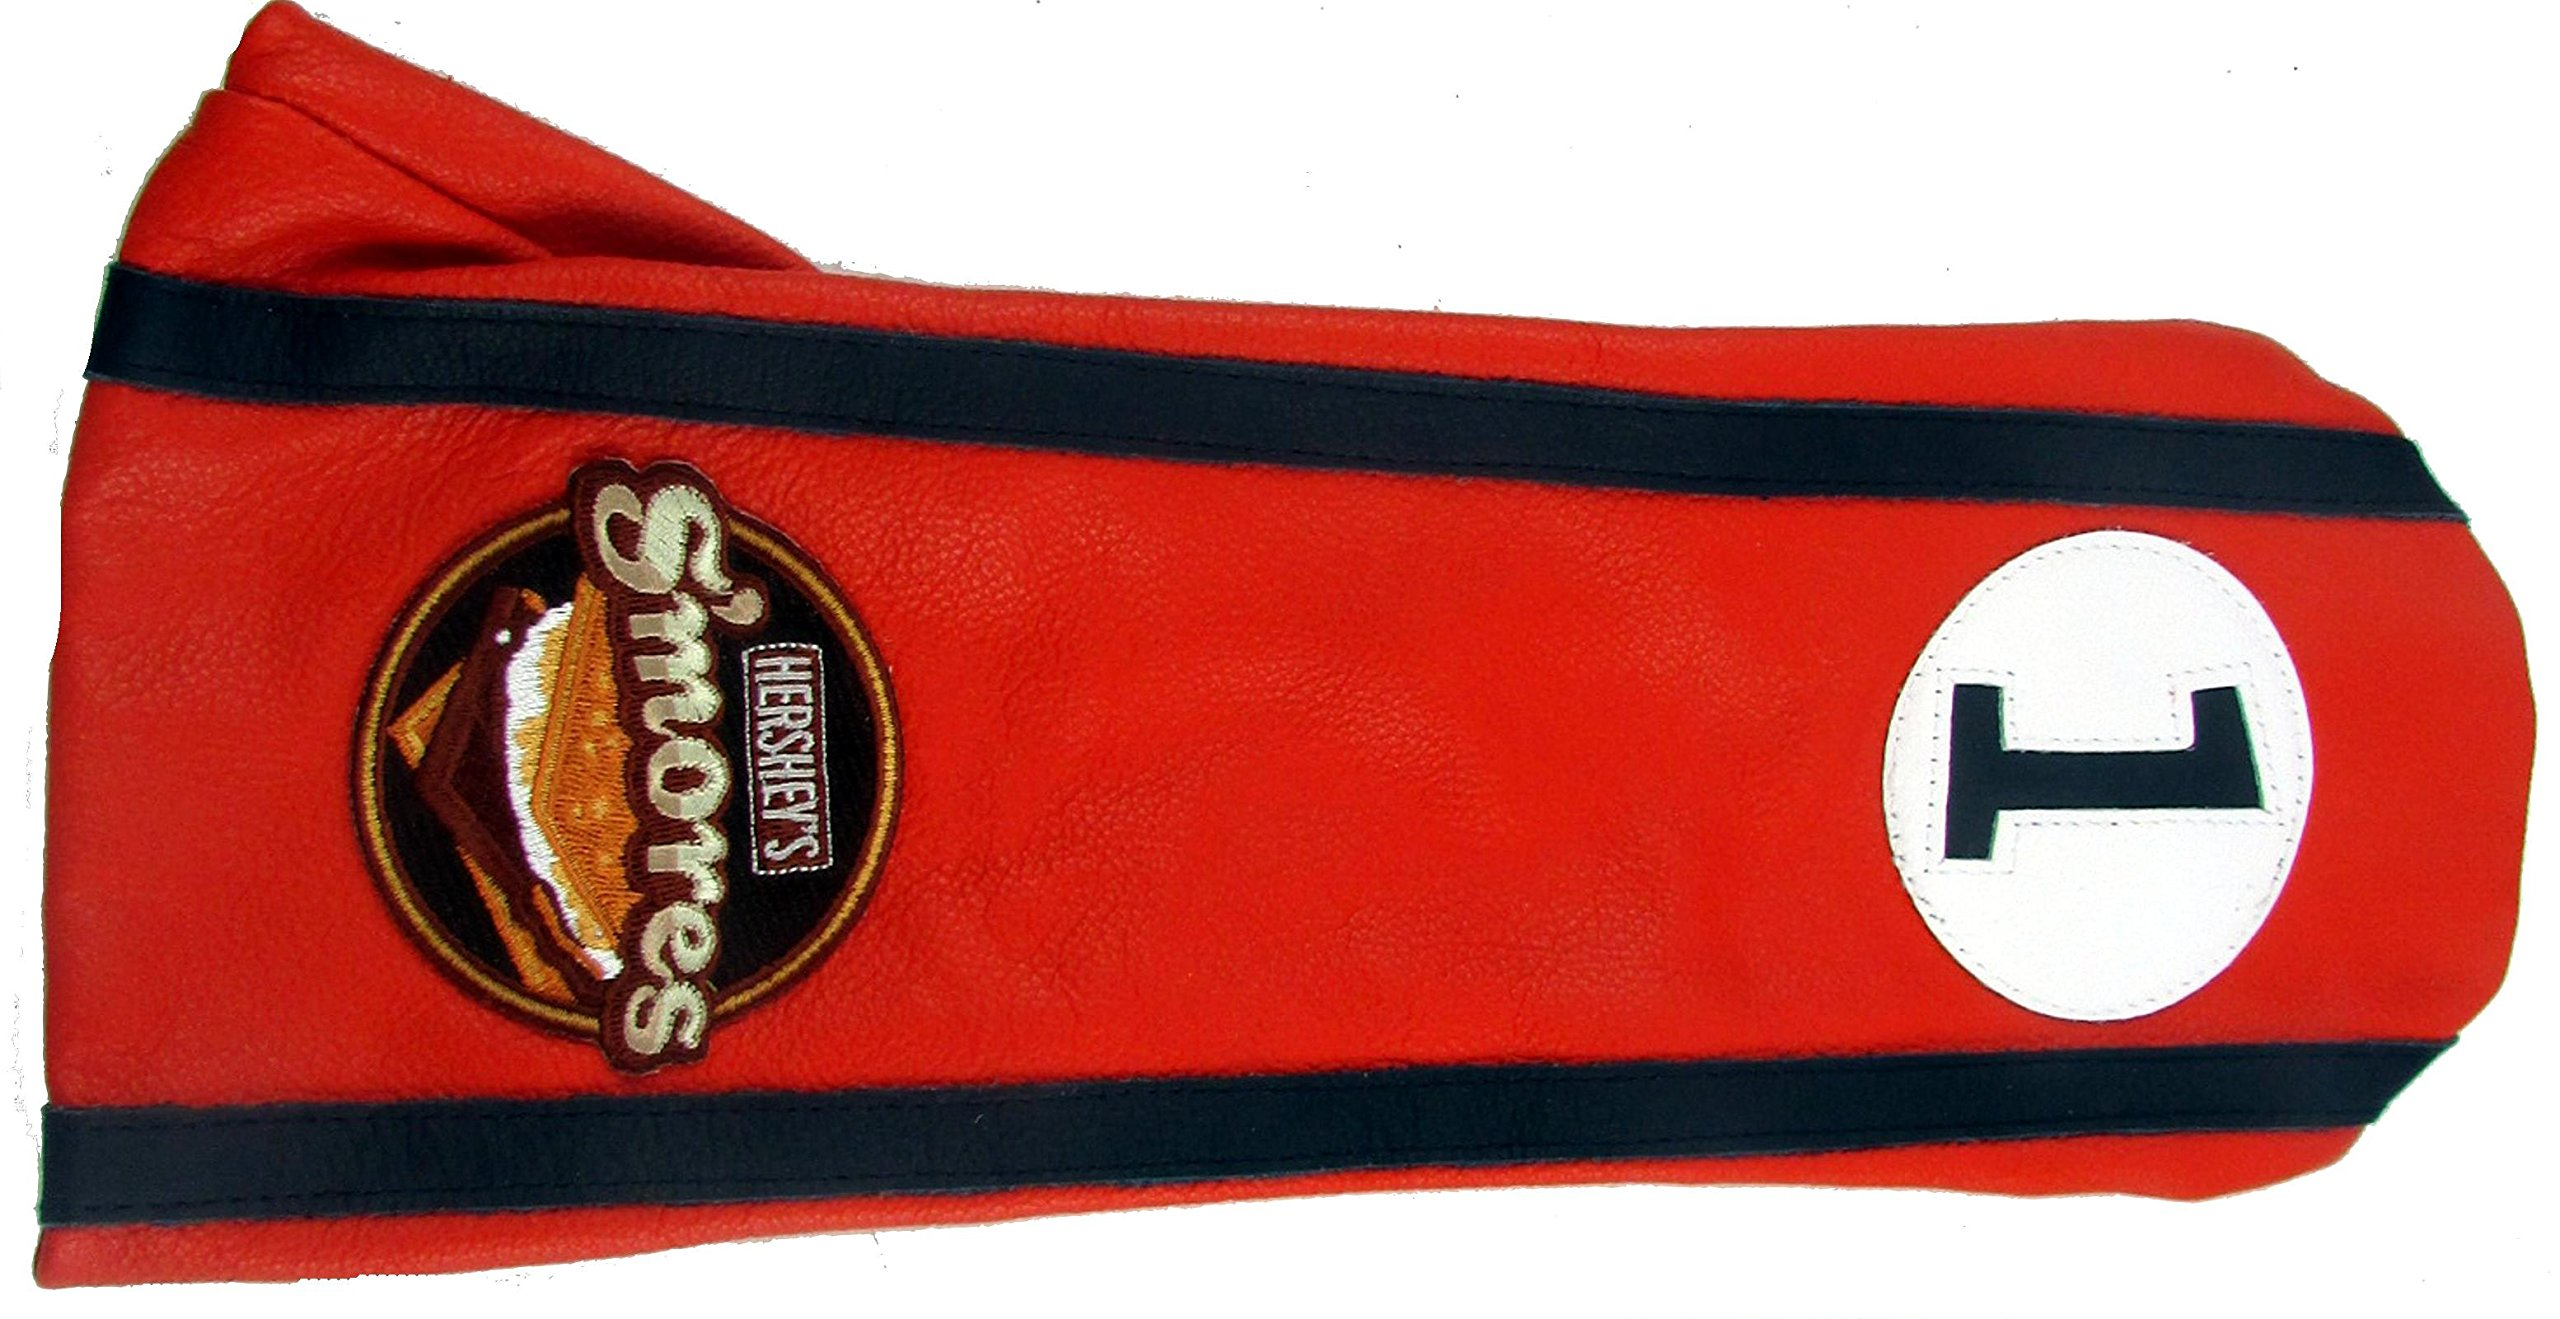 Stitch Golf Club Leather Driver Headcover HERSHEY'S SMORES Orange Blue Black